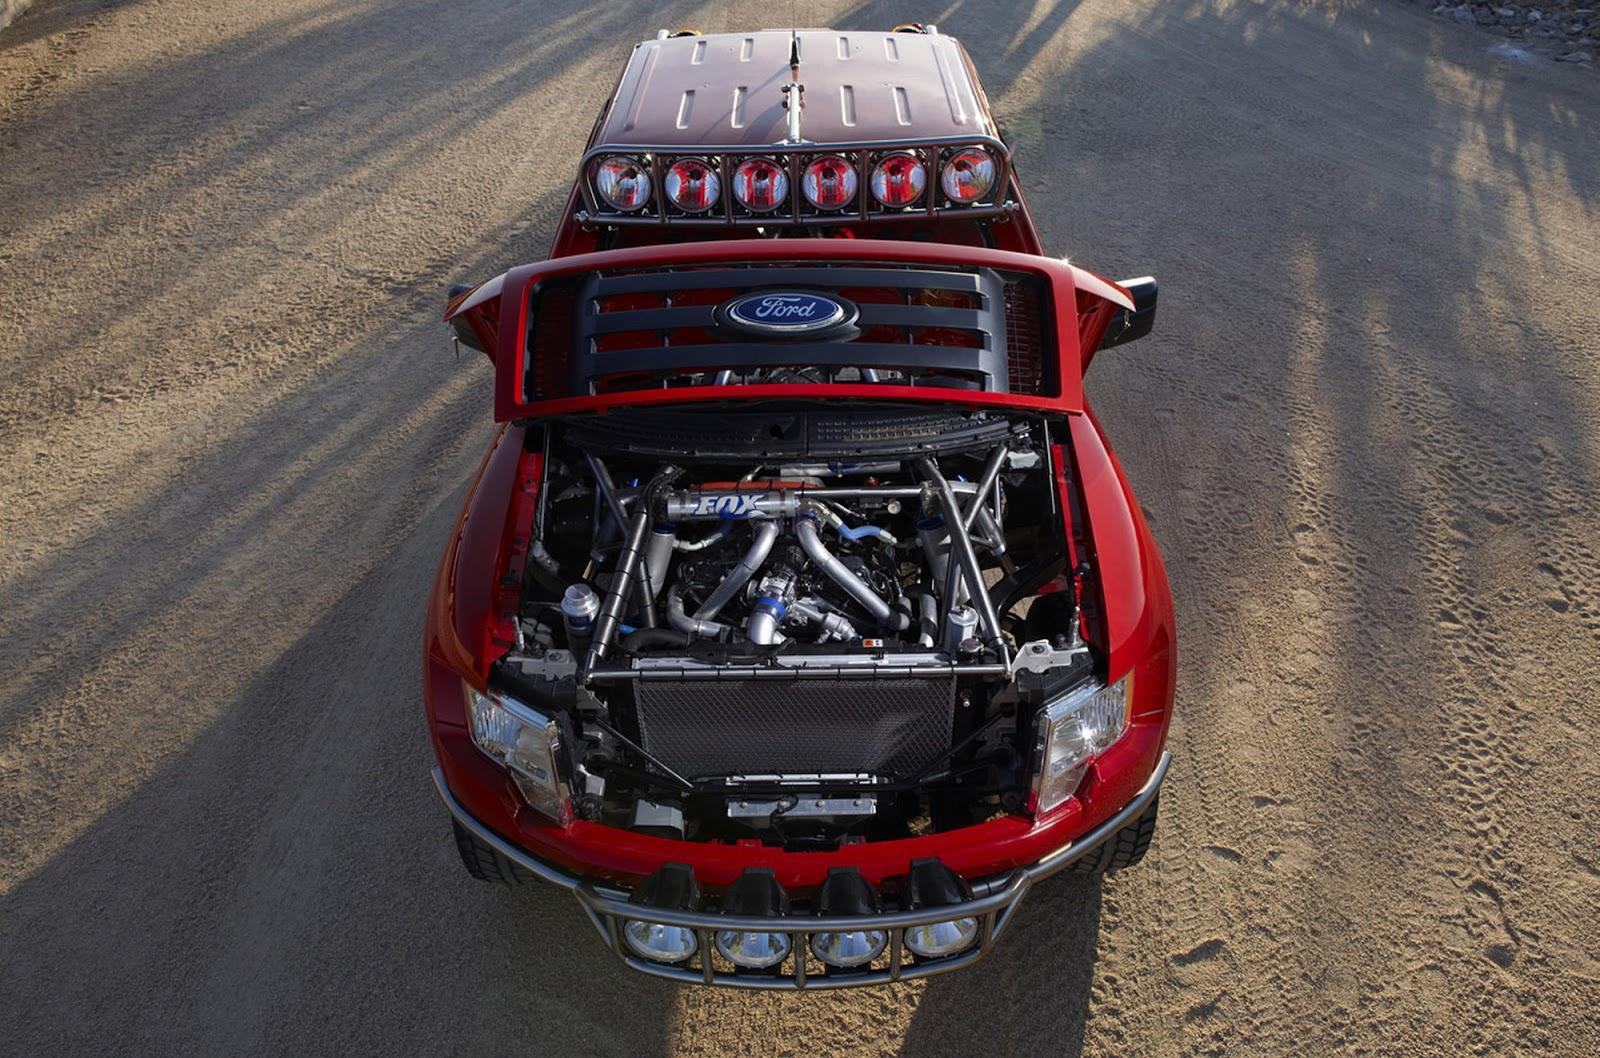 ford s f150 ecoboost engine under federal investigation [ 1600 x 1058 Pixel ]